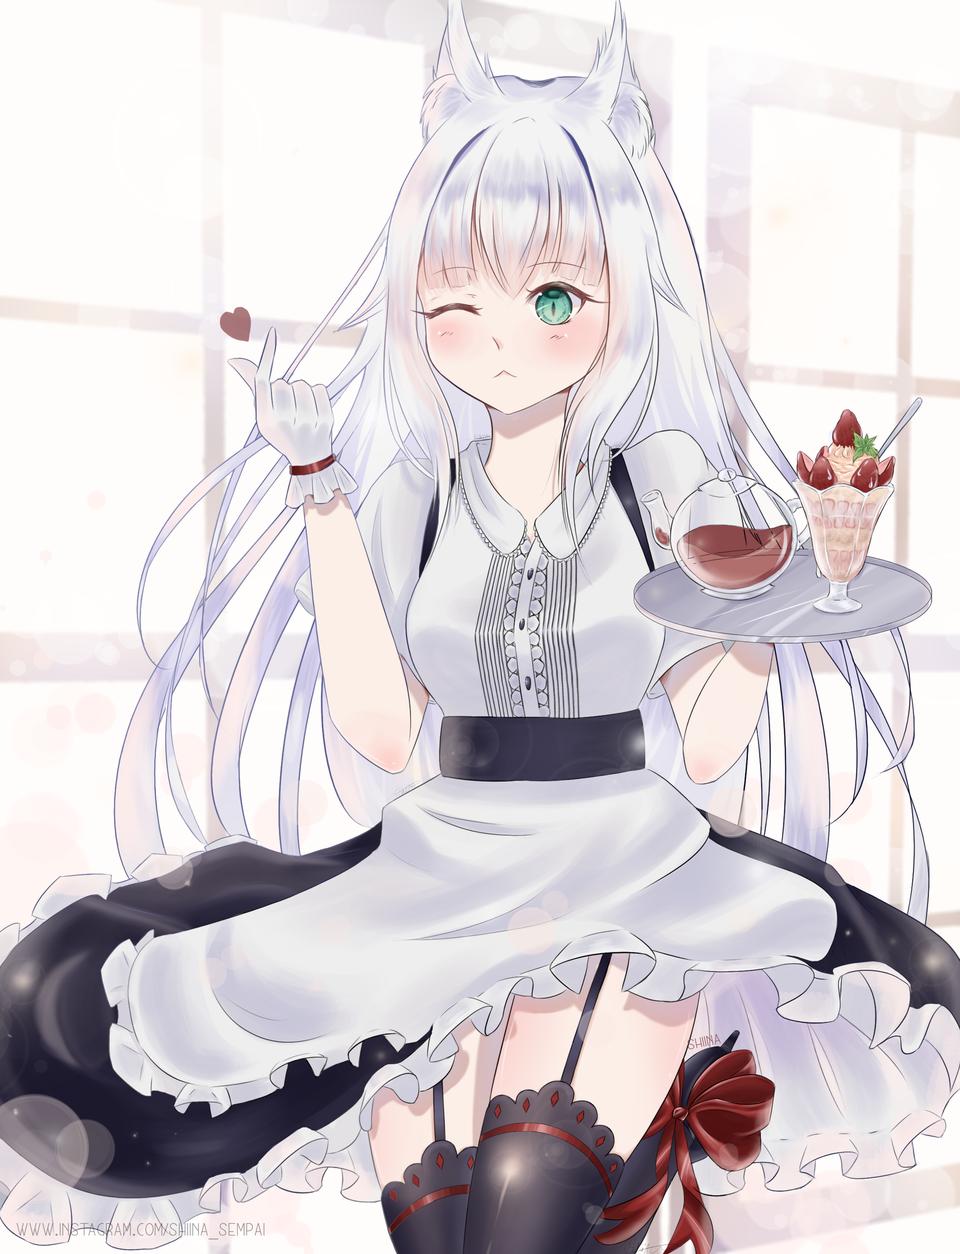 Kitsune Maid Illust of Shiina Sempai anime maid shiina kawaii cute illustration shiinasempai kitsune manga